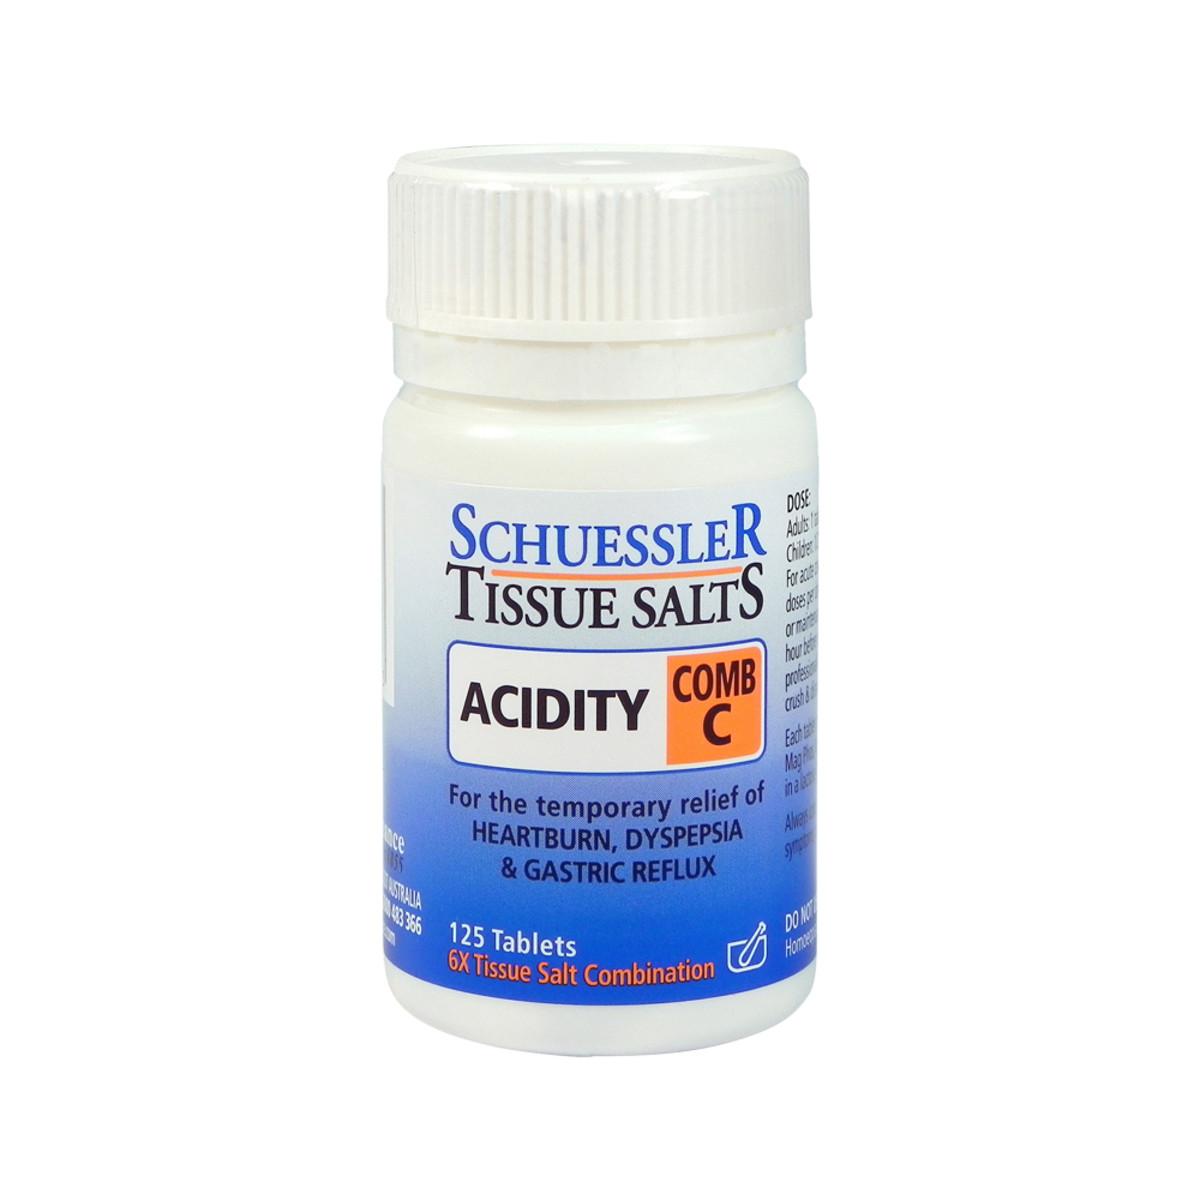 Schuessler Tissue Salts Comb C (Acidity) 125t